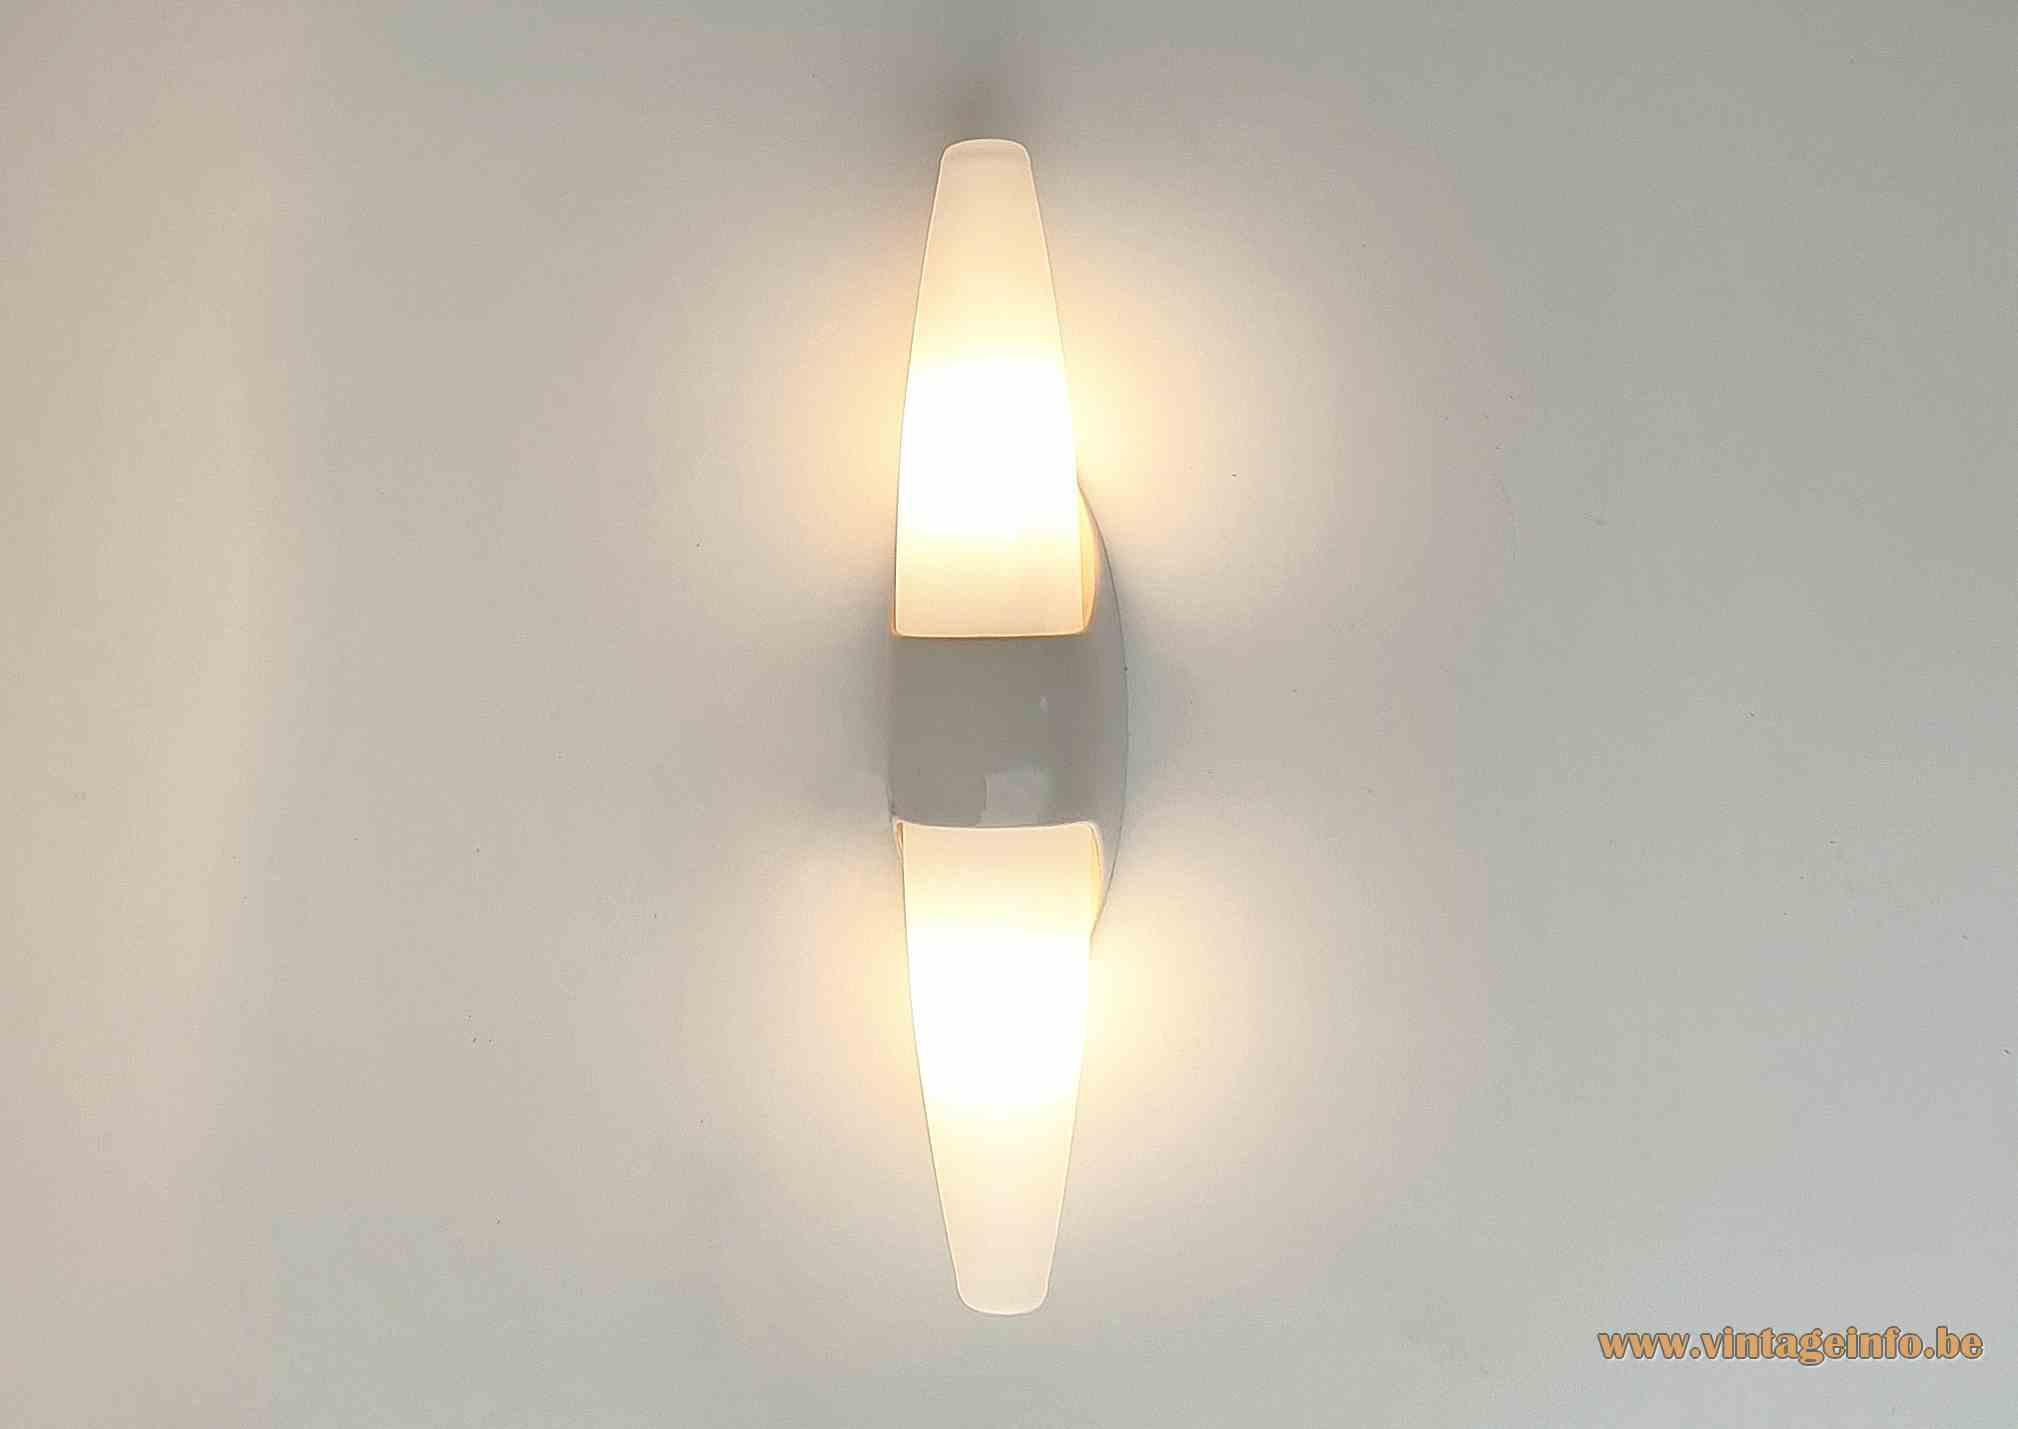 Bo-Niko wall lamp double lampshade white Bakelite mat frosted opal glass Sint Niklaas Belgium 1960s MCM Mid-Century Modern